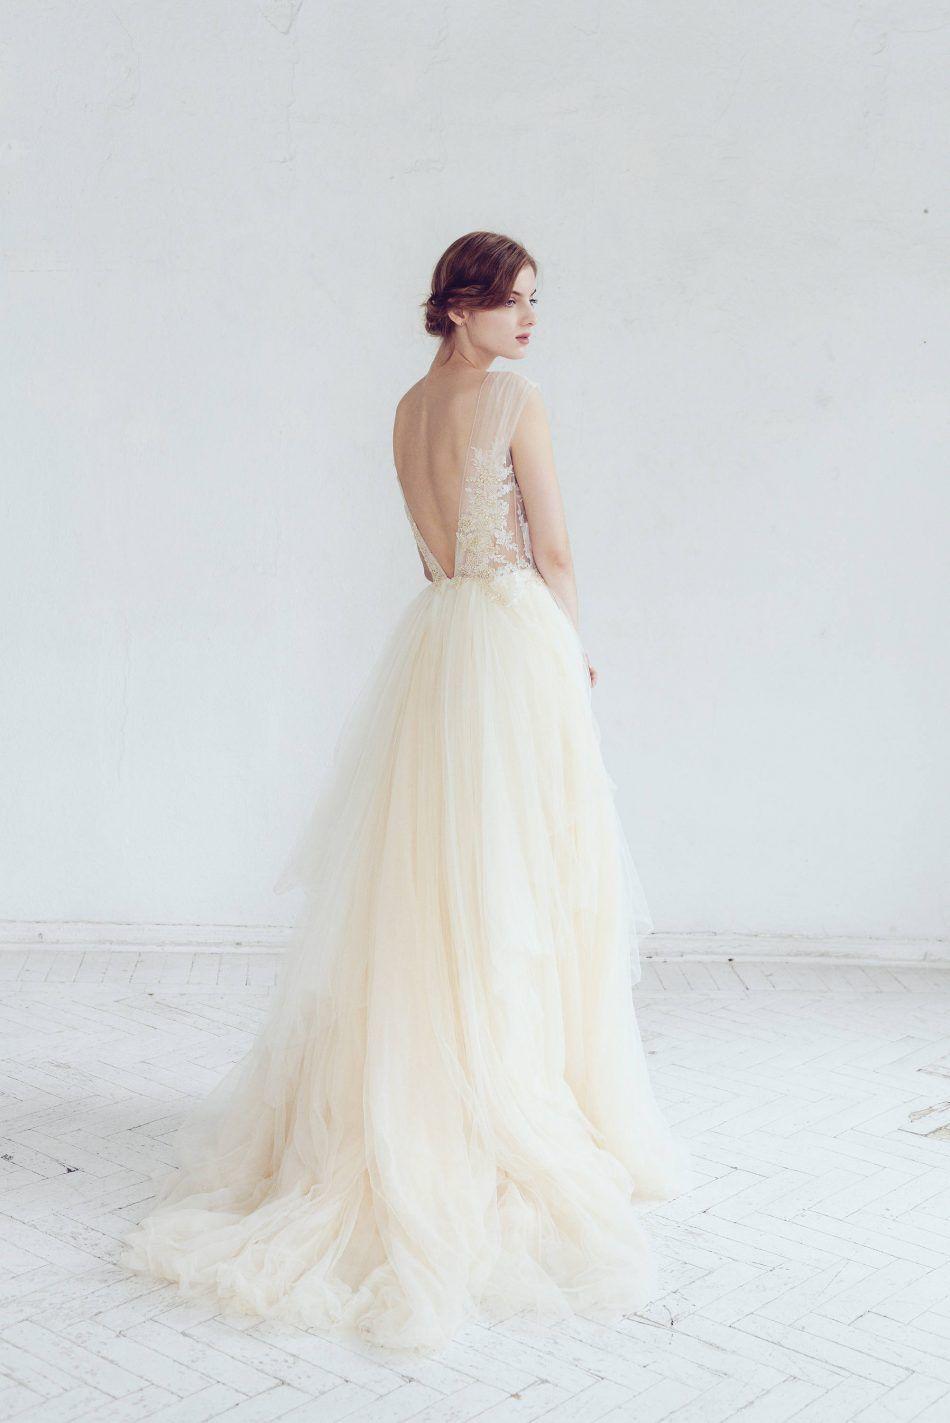 Champagne and ivory wedding dress  Champagne u Ivory Tulle Wedding Dress  Chic vintage brides